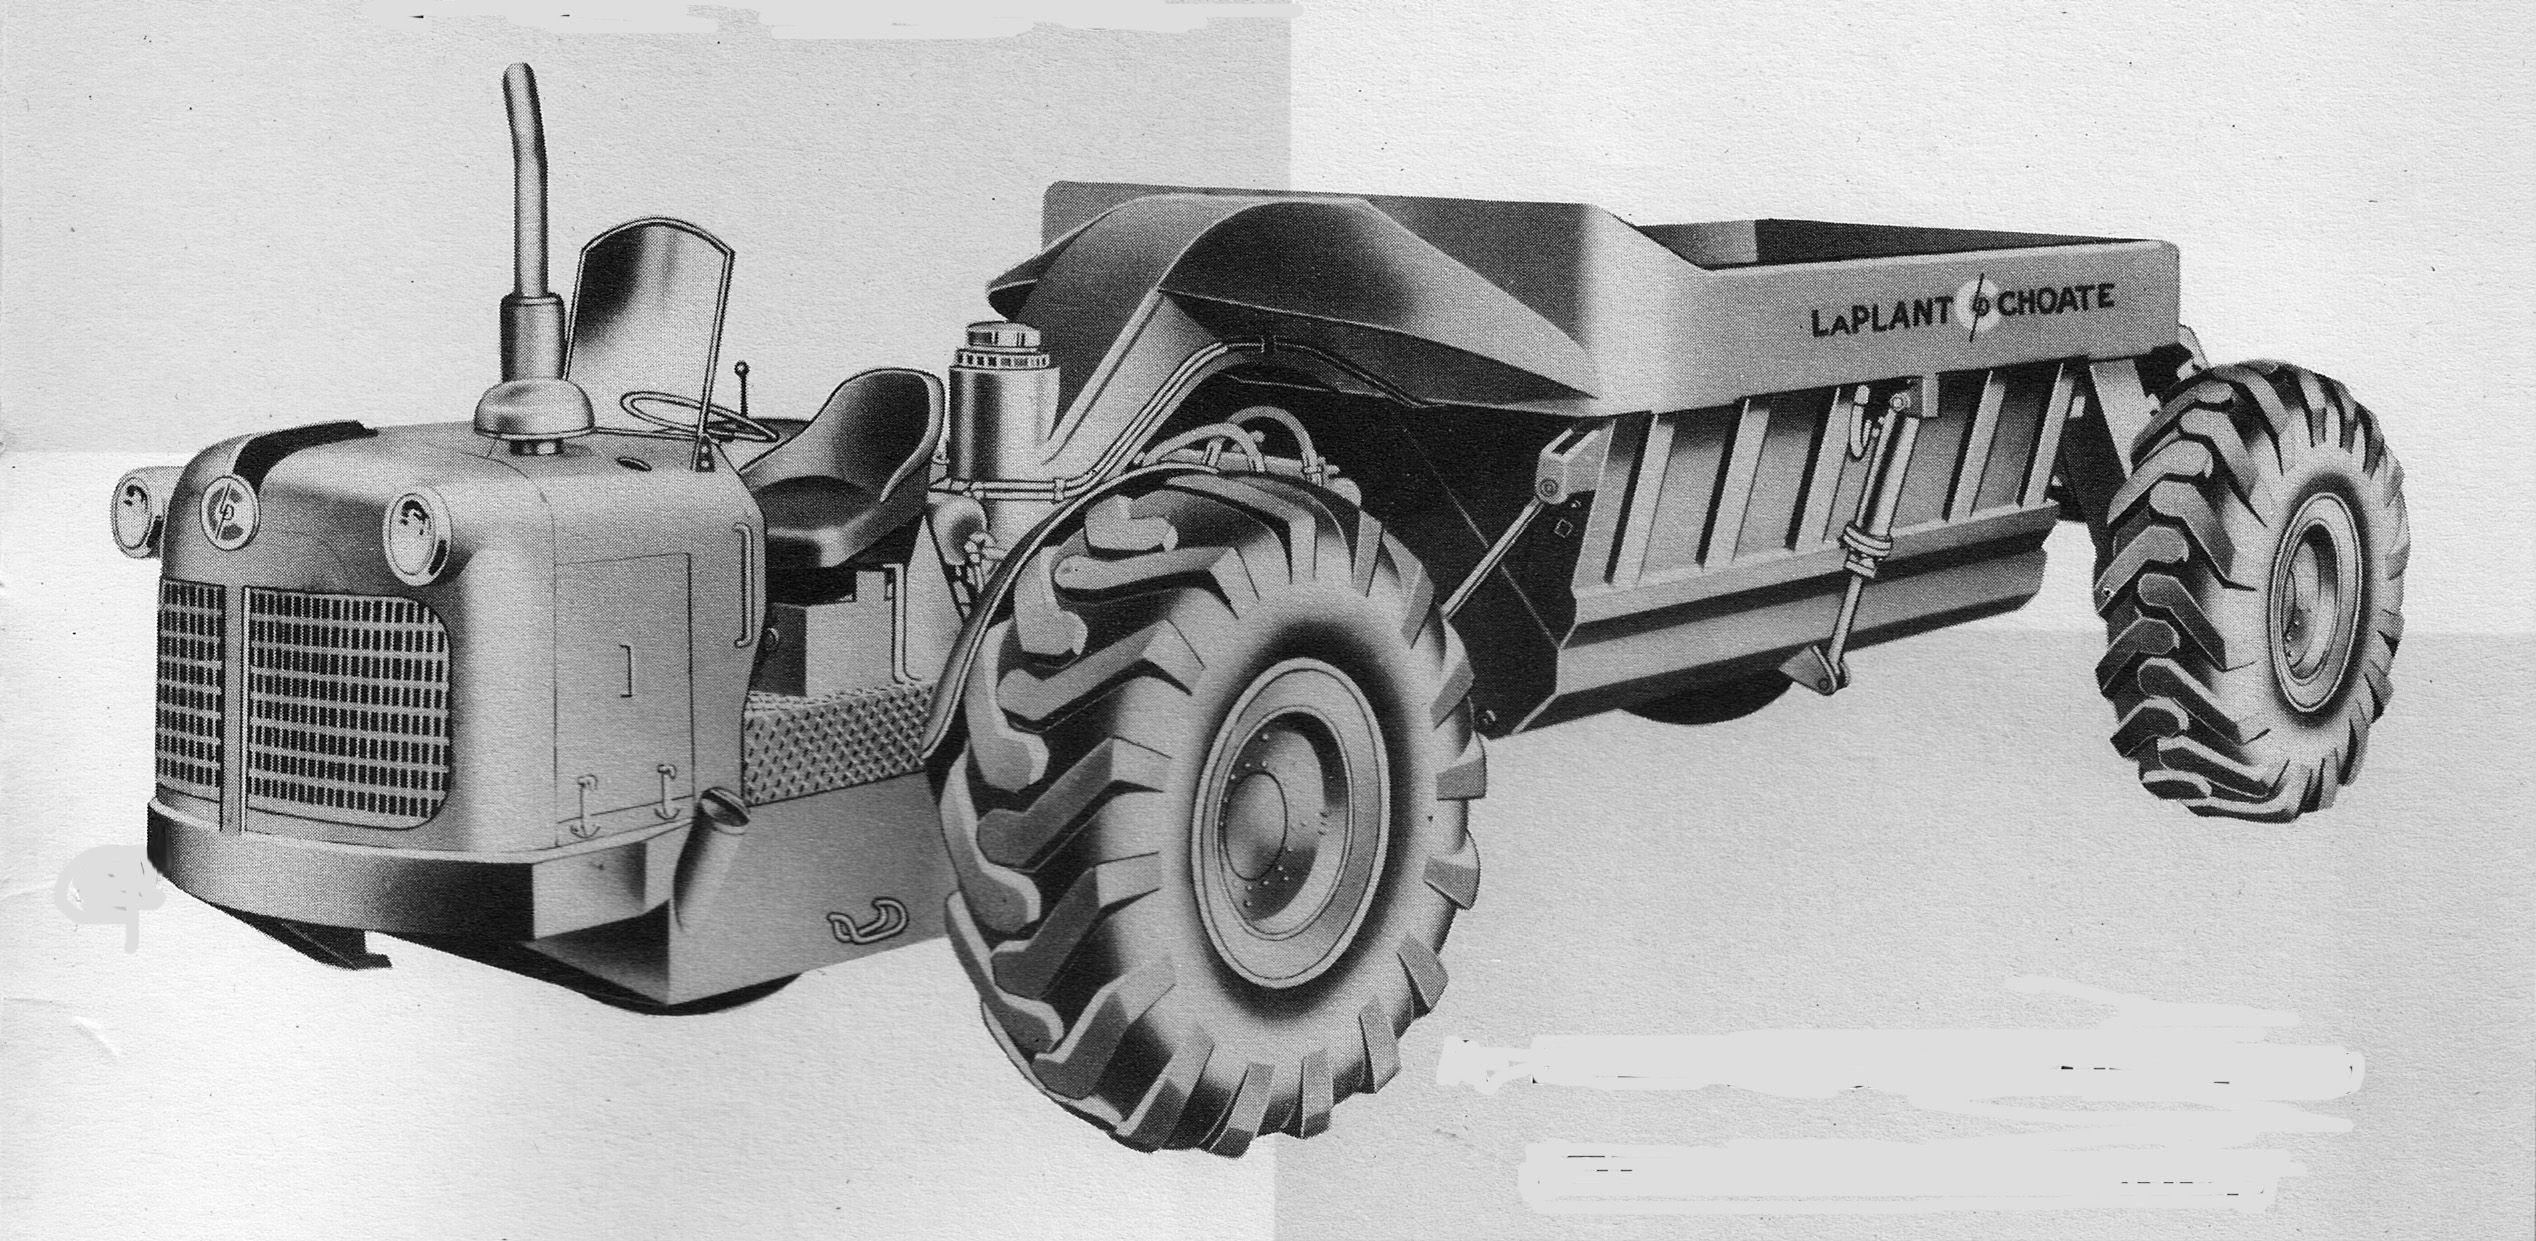 LaPlantChoate Earth moving equipment, Wagon, Monster trucks